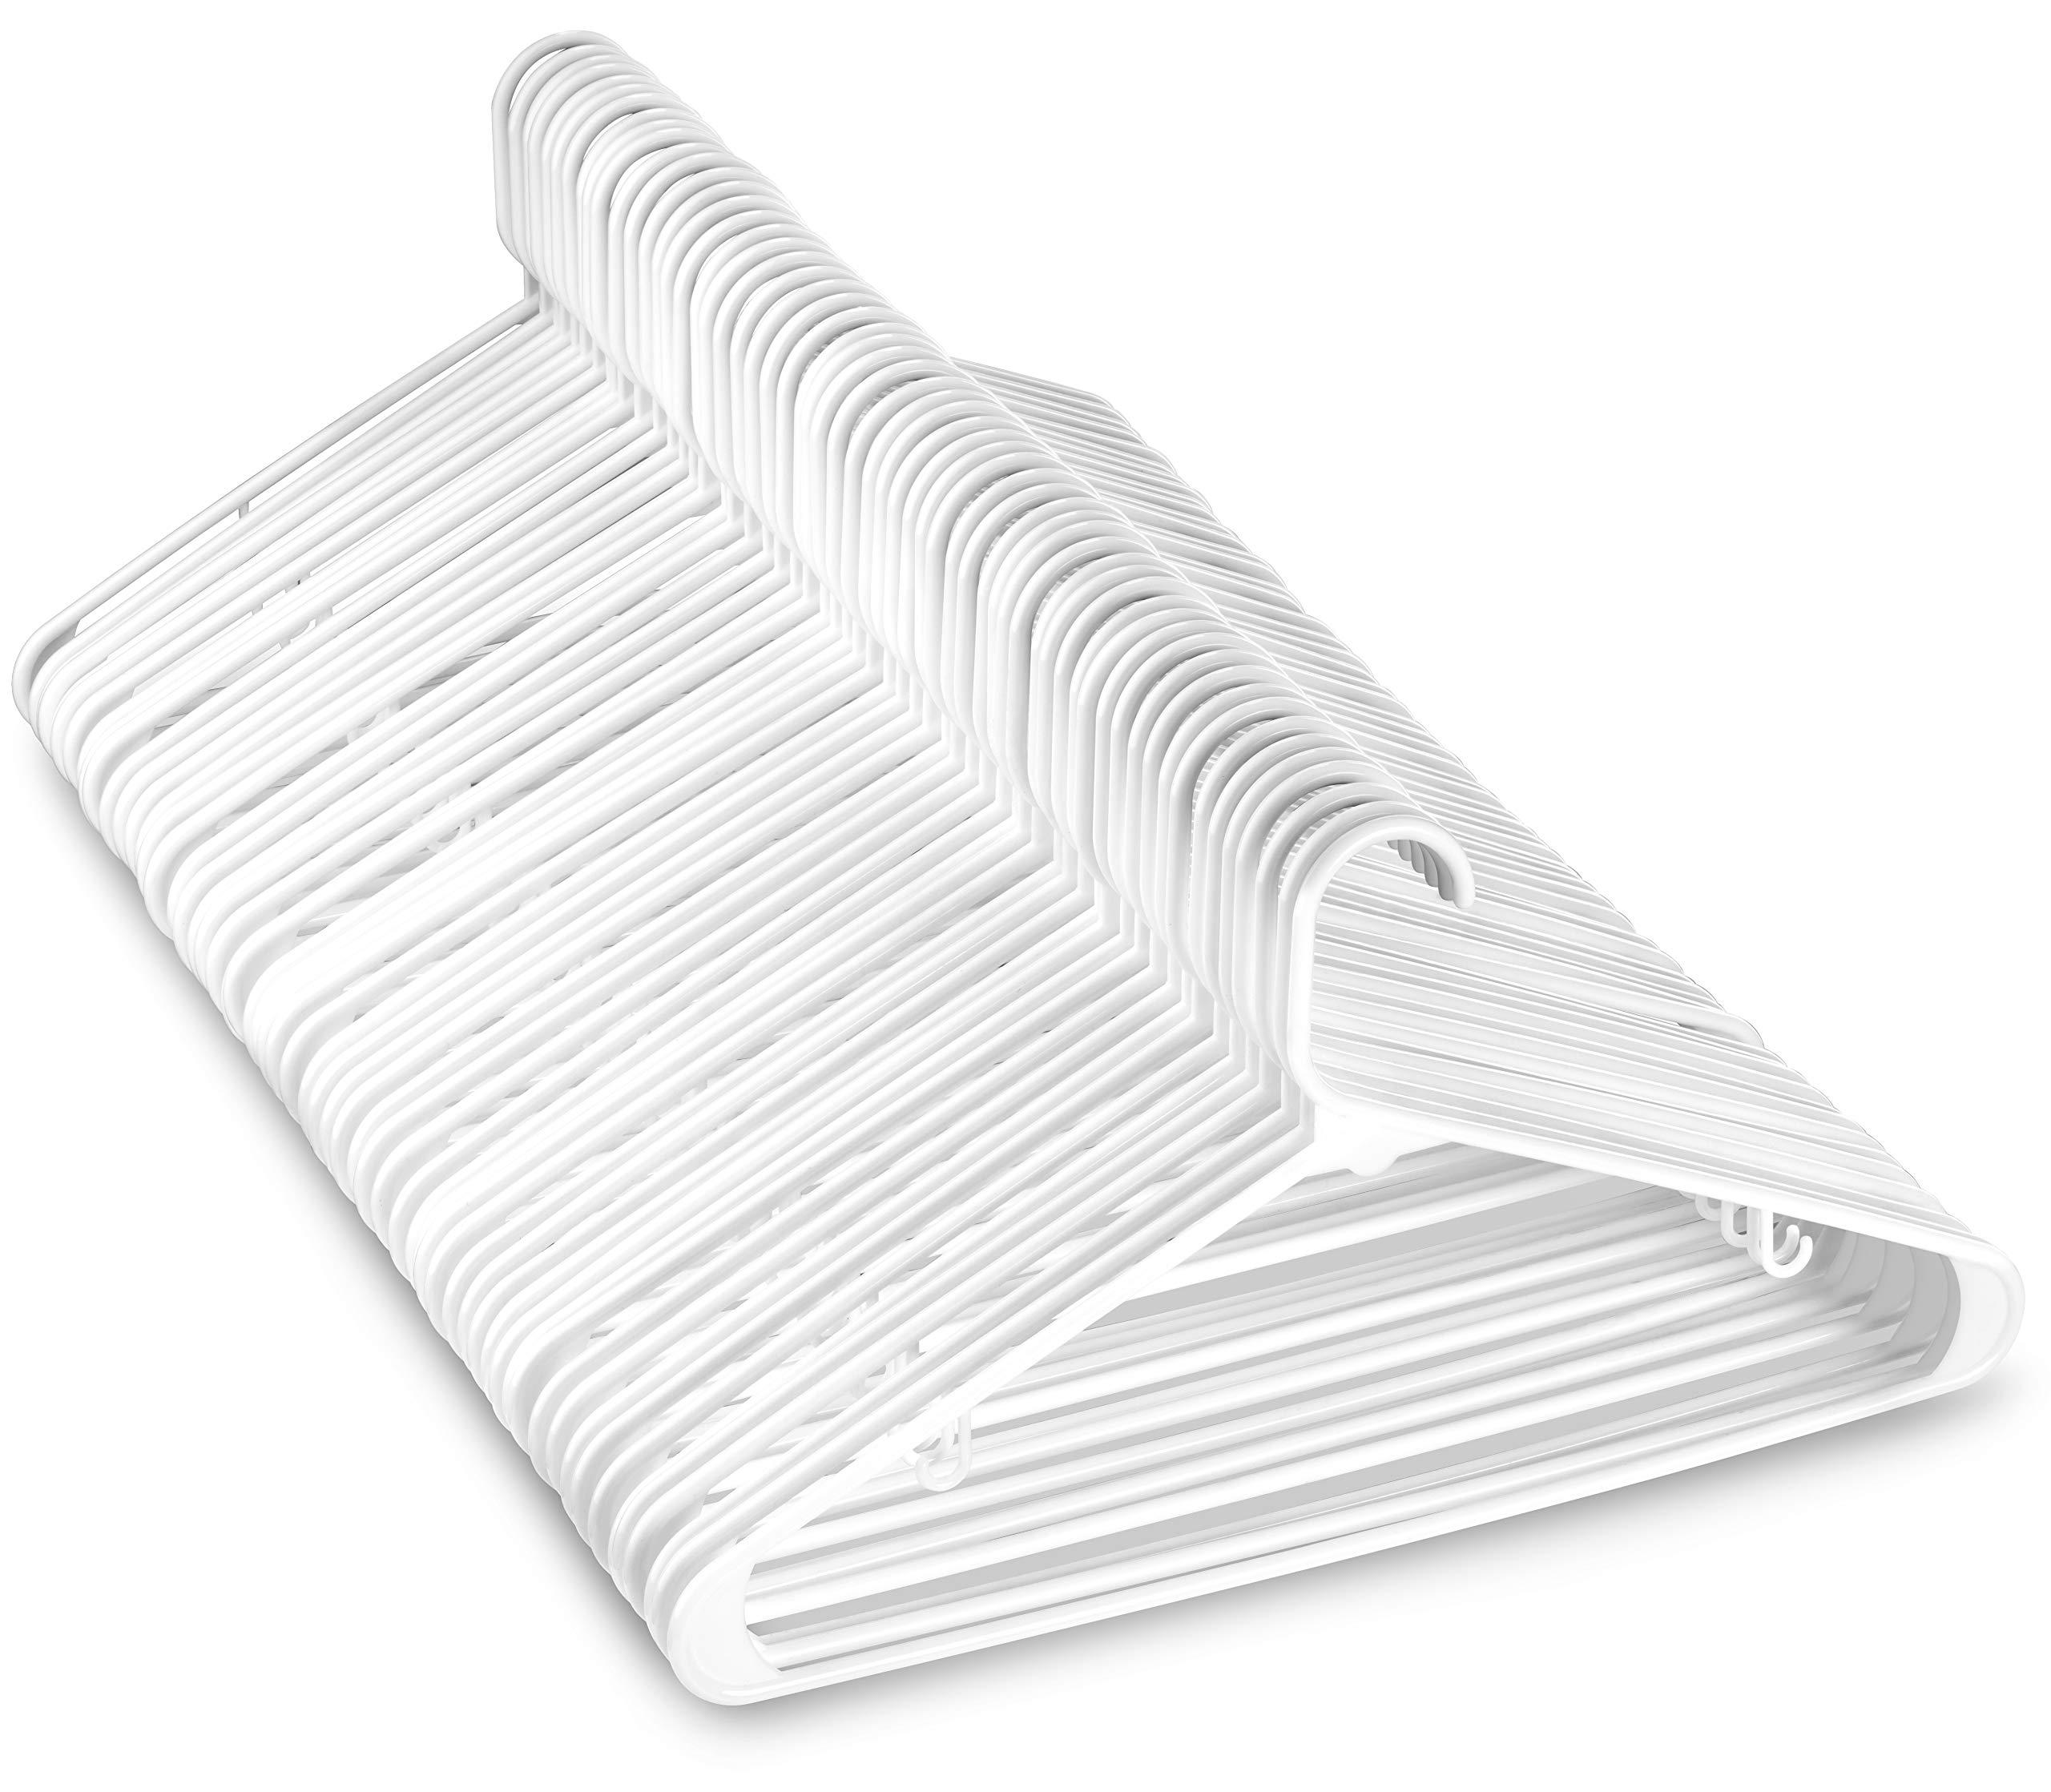 Hangon Combo Set  Plastic Shirt/&Pants Hangers 17 Inch /& 12 Inch Black 30 Pack